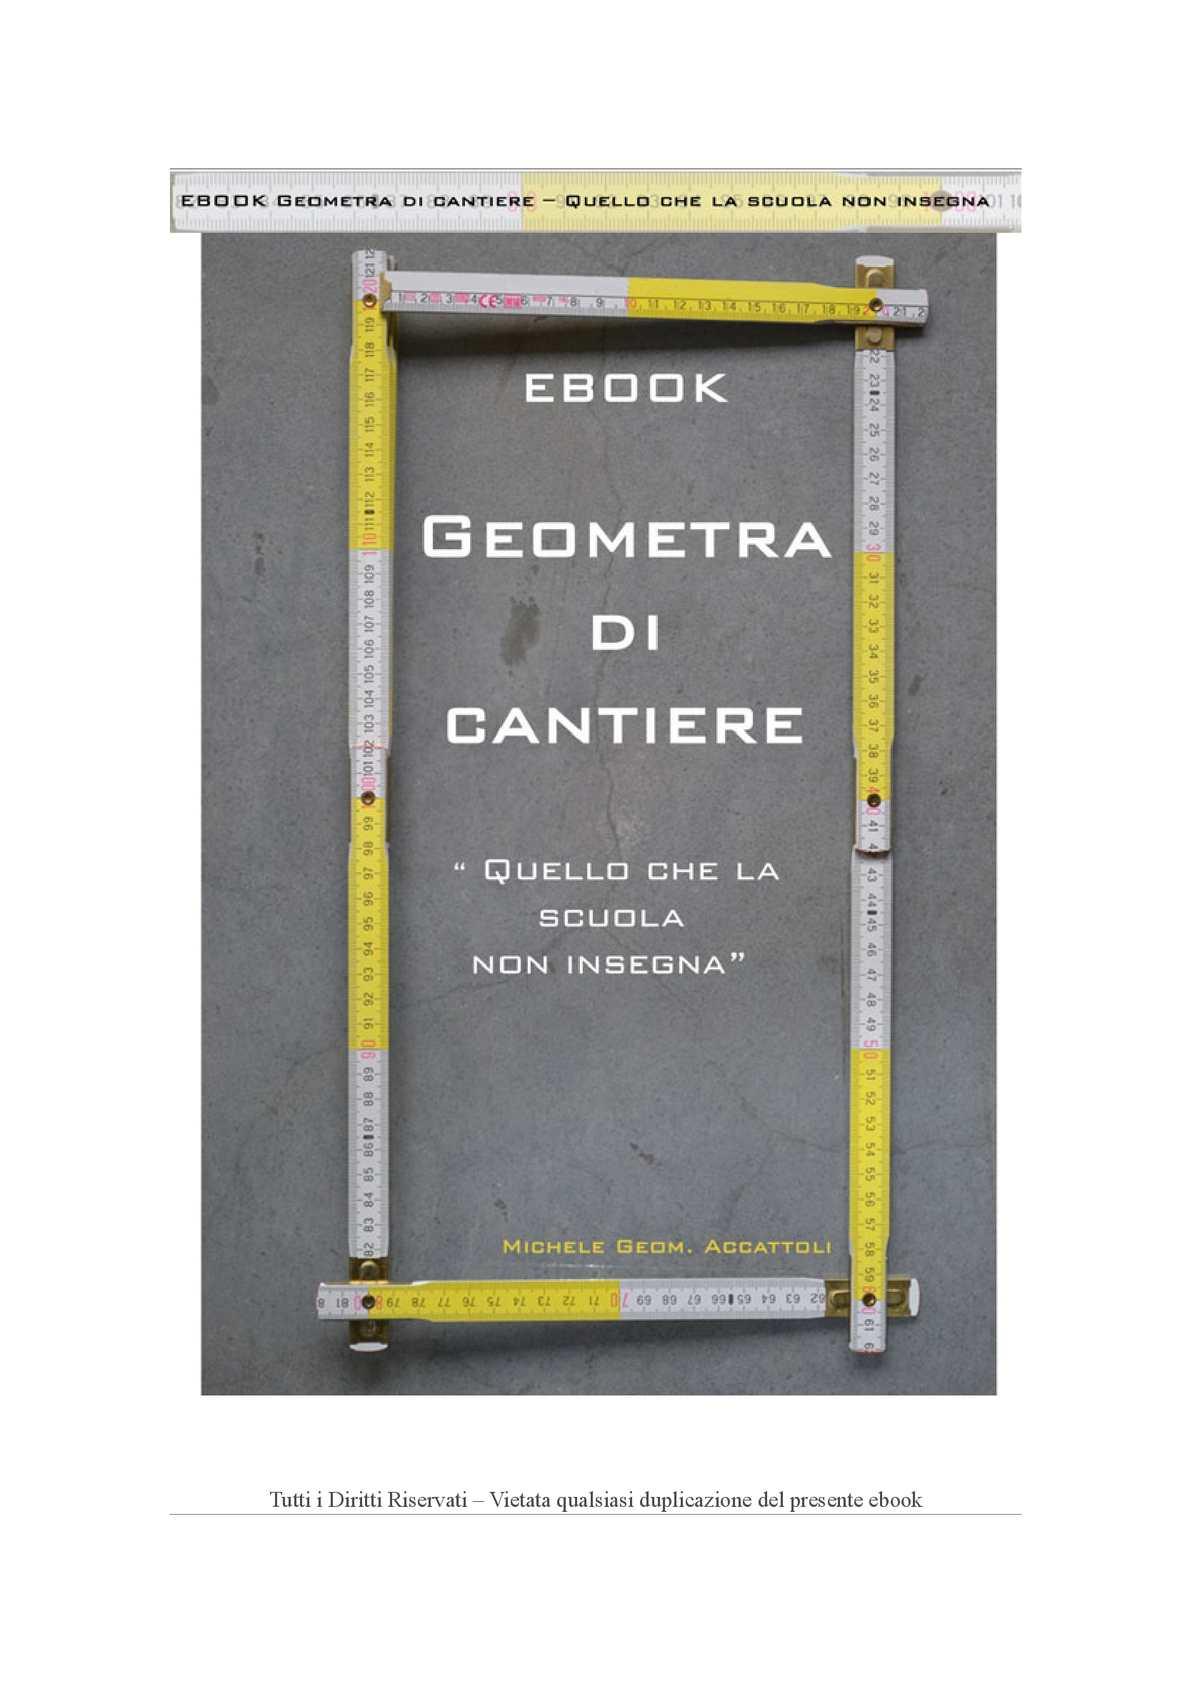 Manuale Del Geometra Pdf Gratis